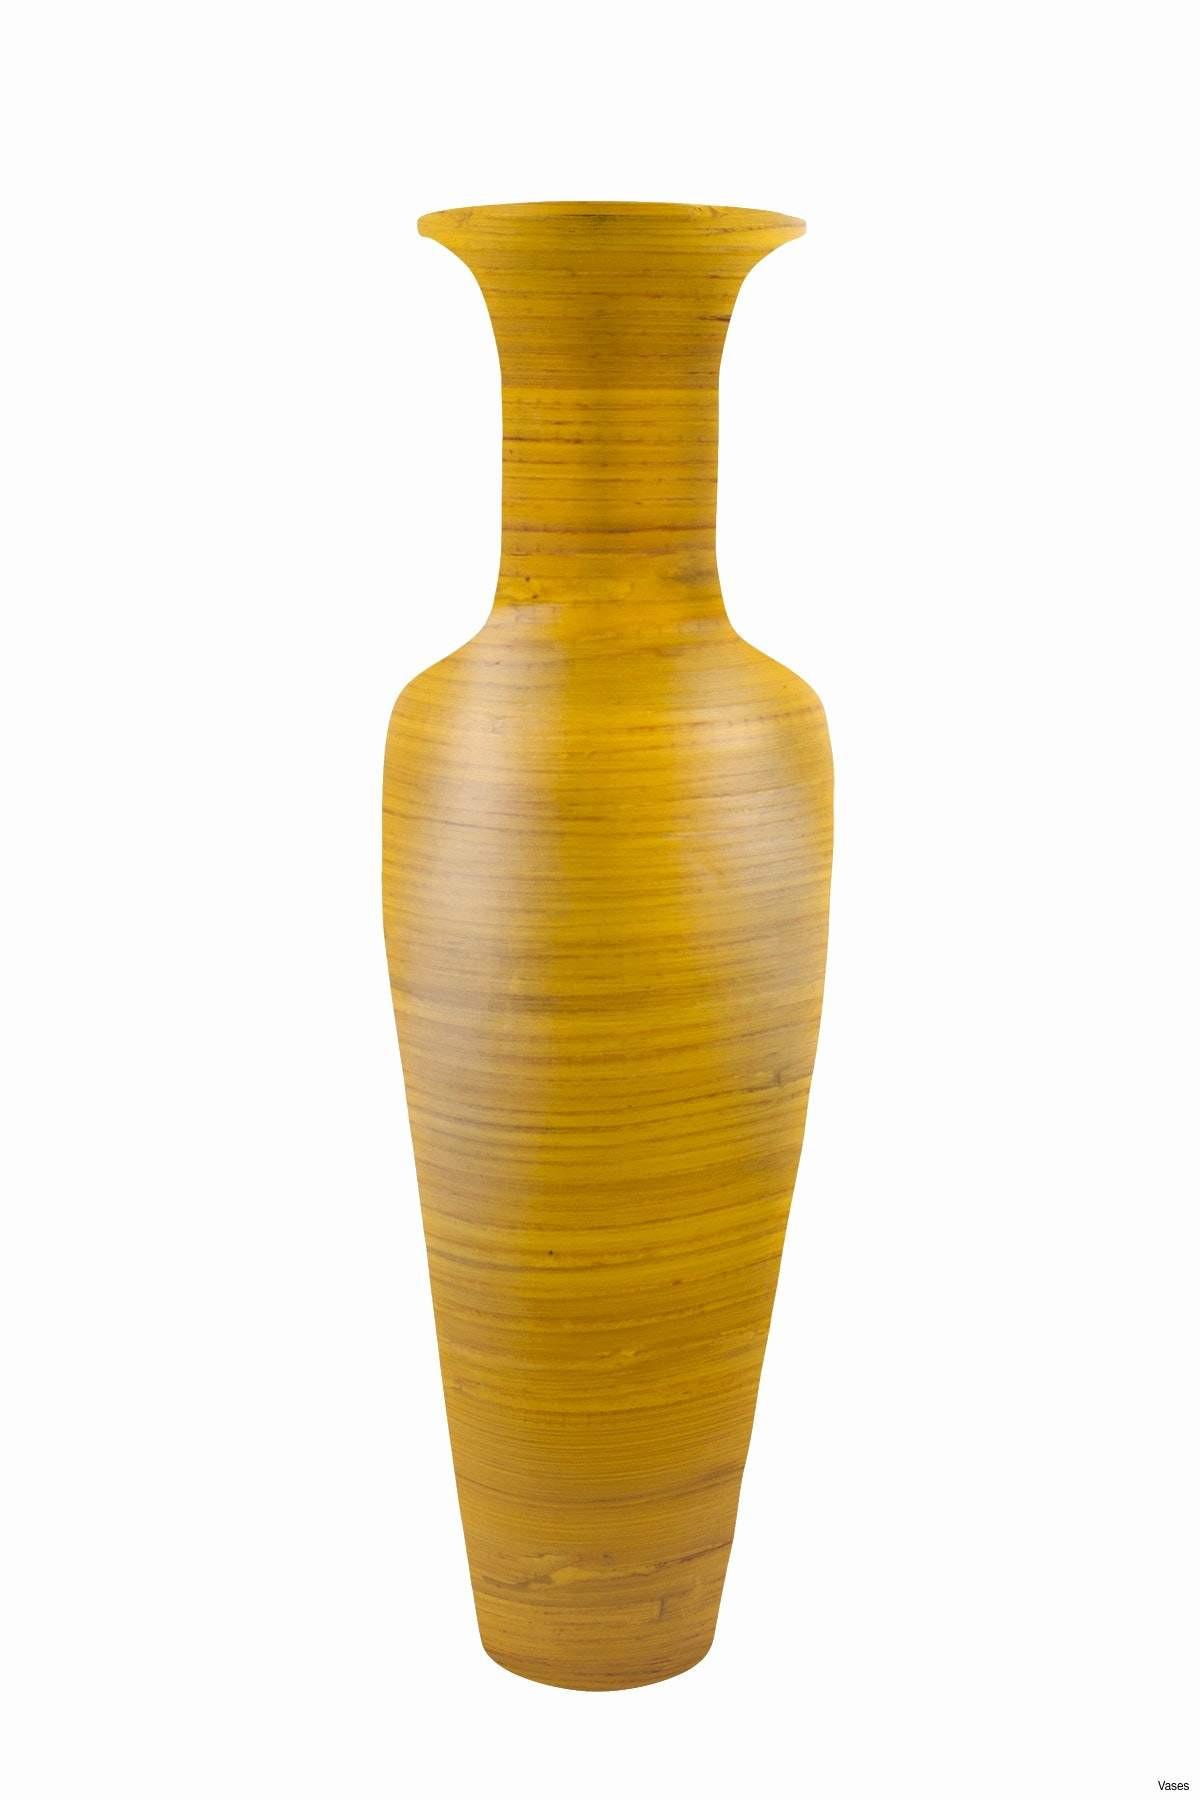 pottery barn vase filler of vases set of 3 images area floor rugs new joaquin gray vases set 3 inside area floor rugs new joaquin gray vases set 3 2h pottery floor i 0d